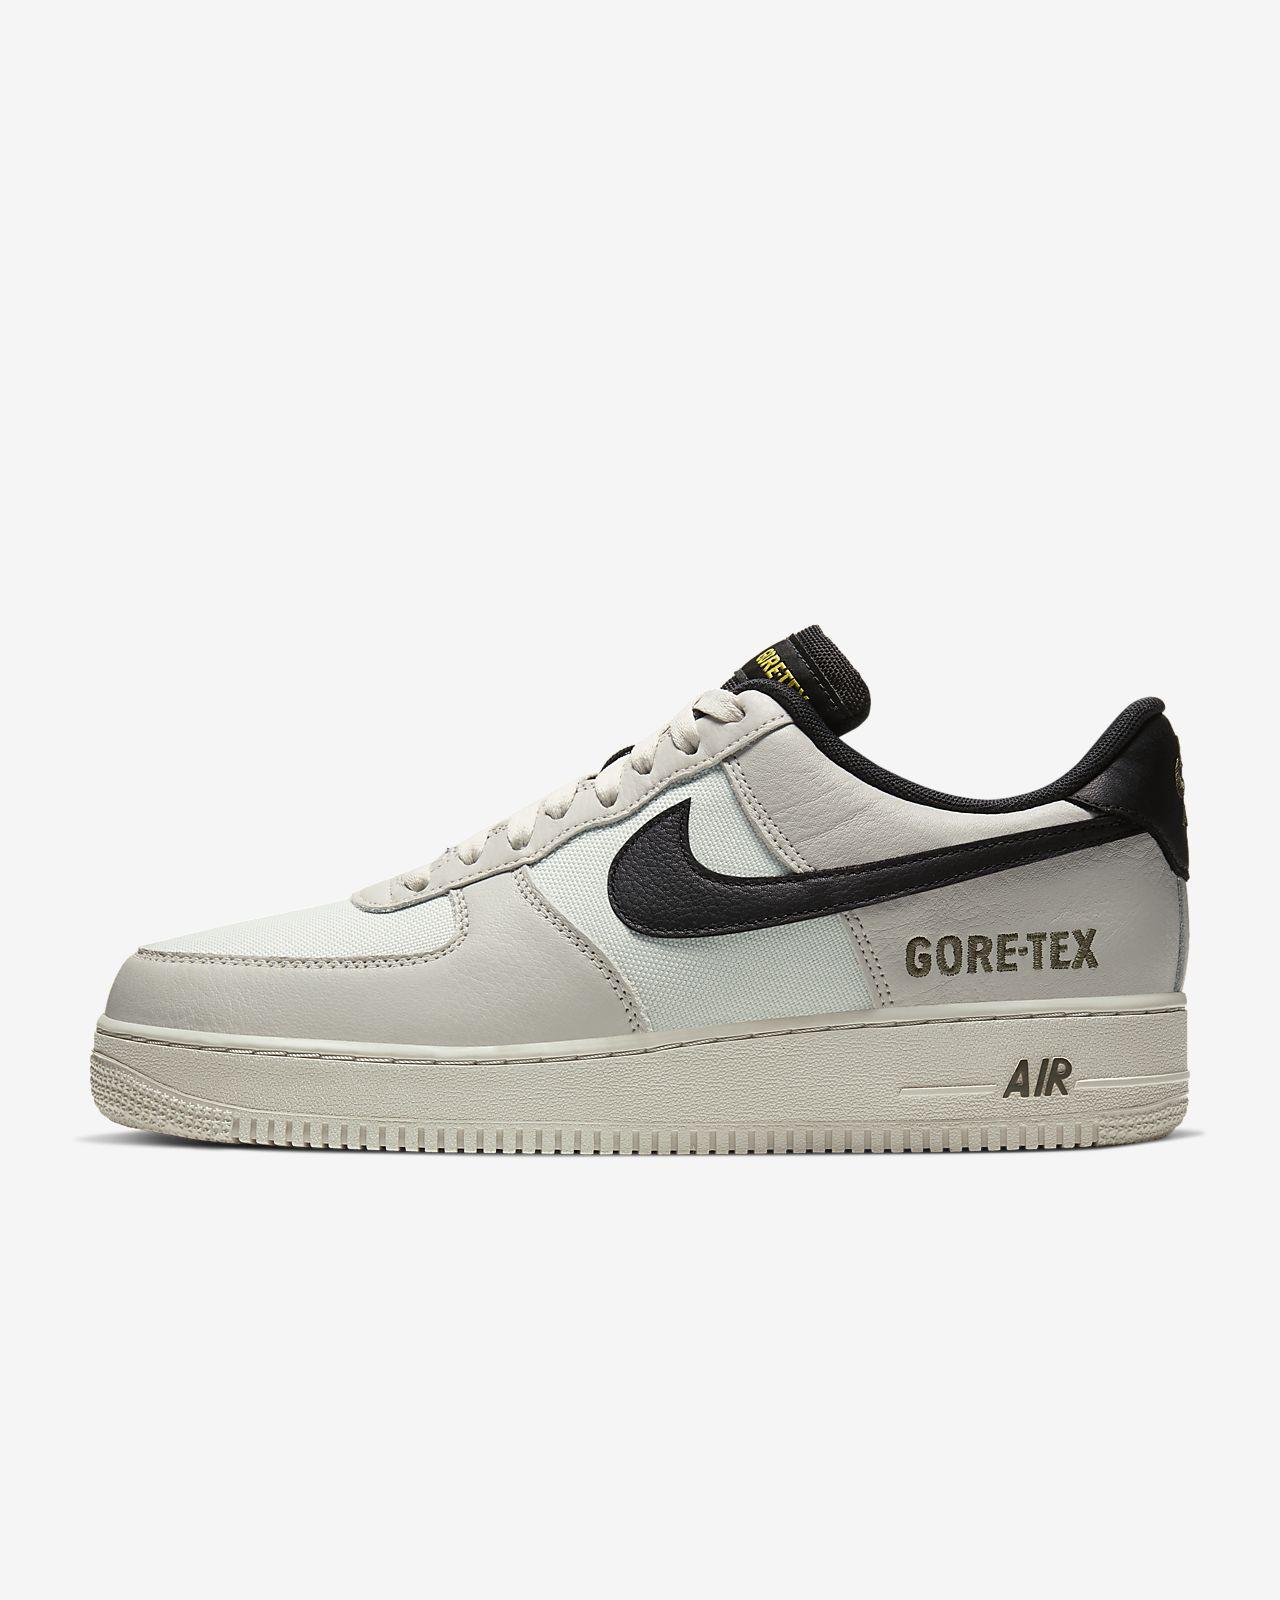 Nike Air Force 1 GORE-TEX Shoe